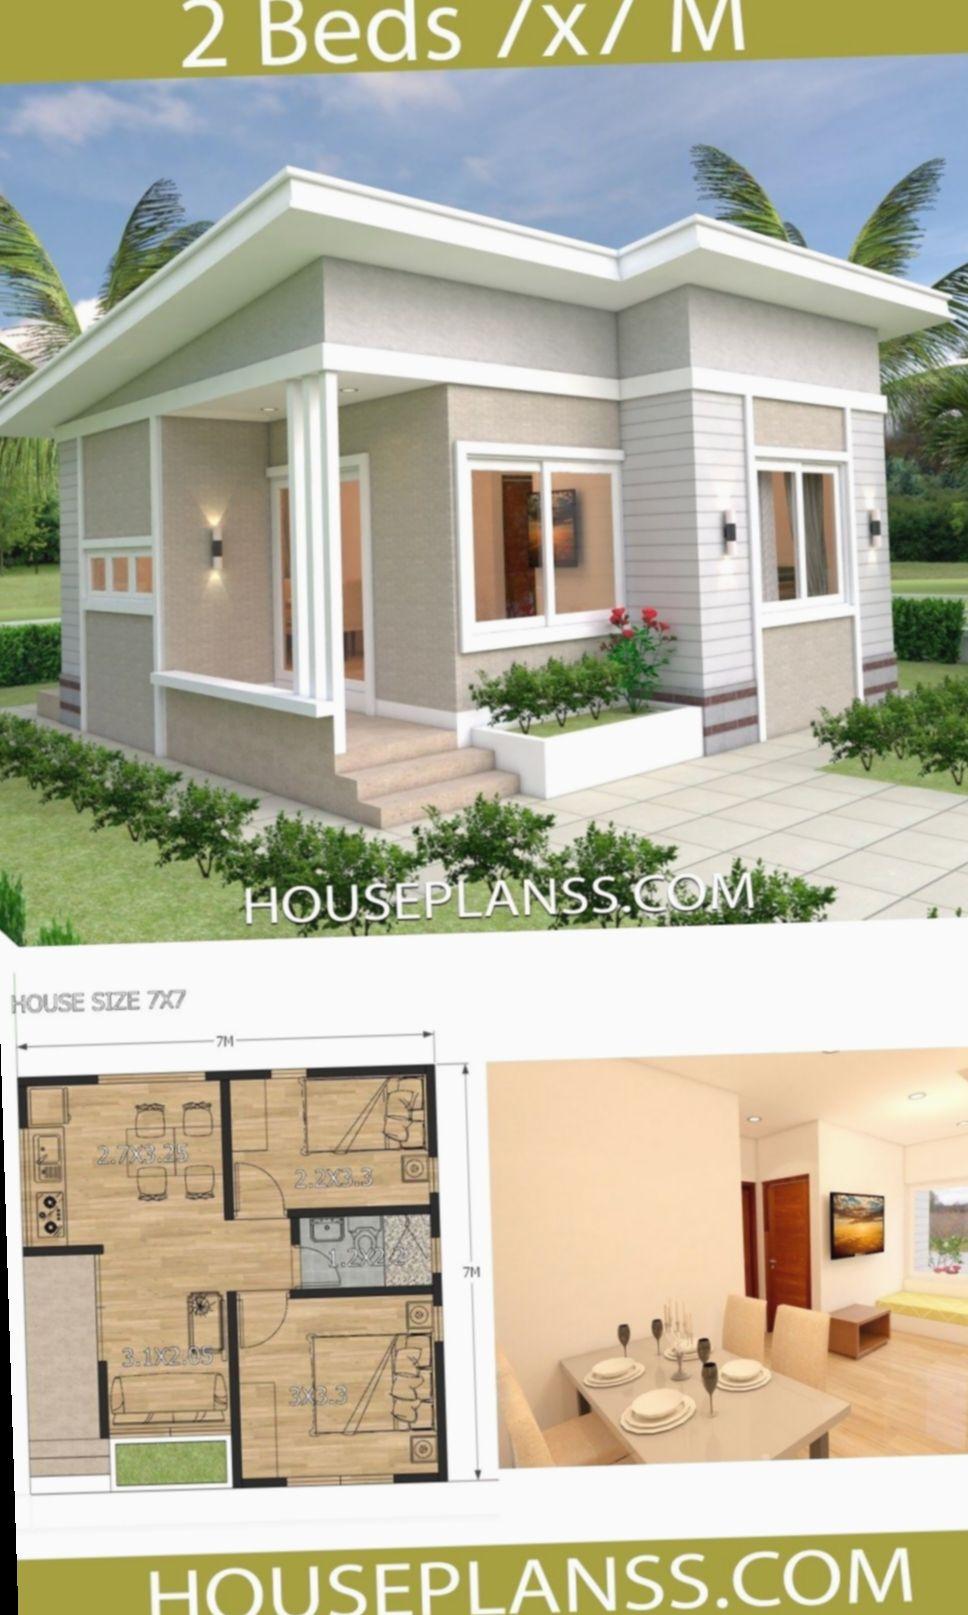 12 Diy House Decorations Decor Small House Design Plans Small House Design Sims House Plans